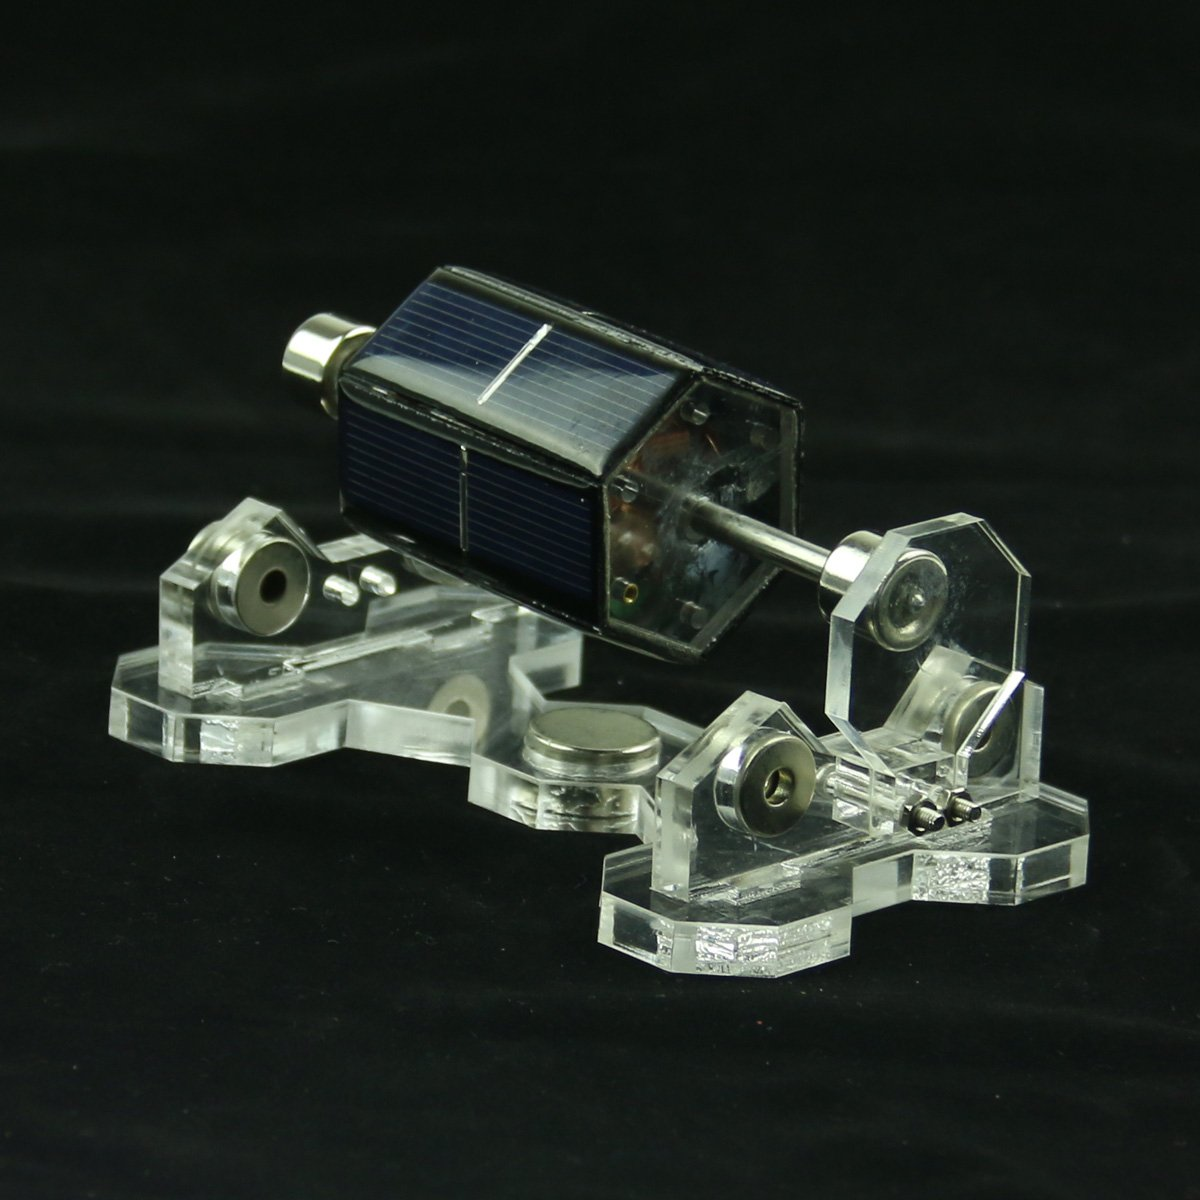 lieomo 5.5'' Hand Made Mendocino Solar Motor Magnetic Levitating Solar Motor Model